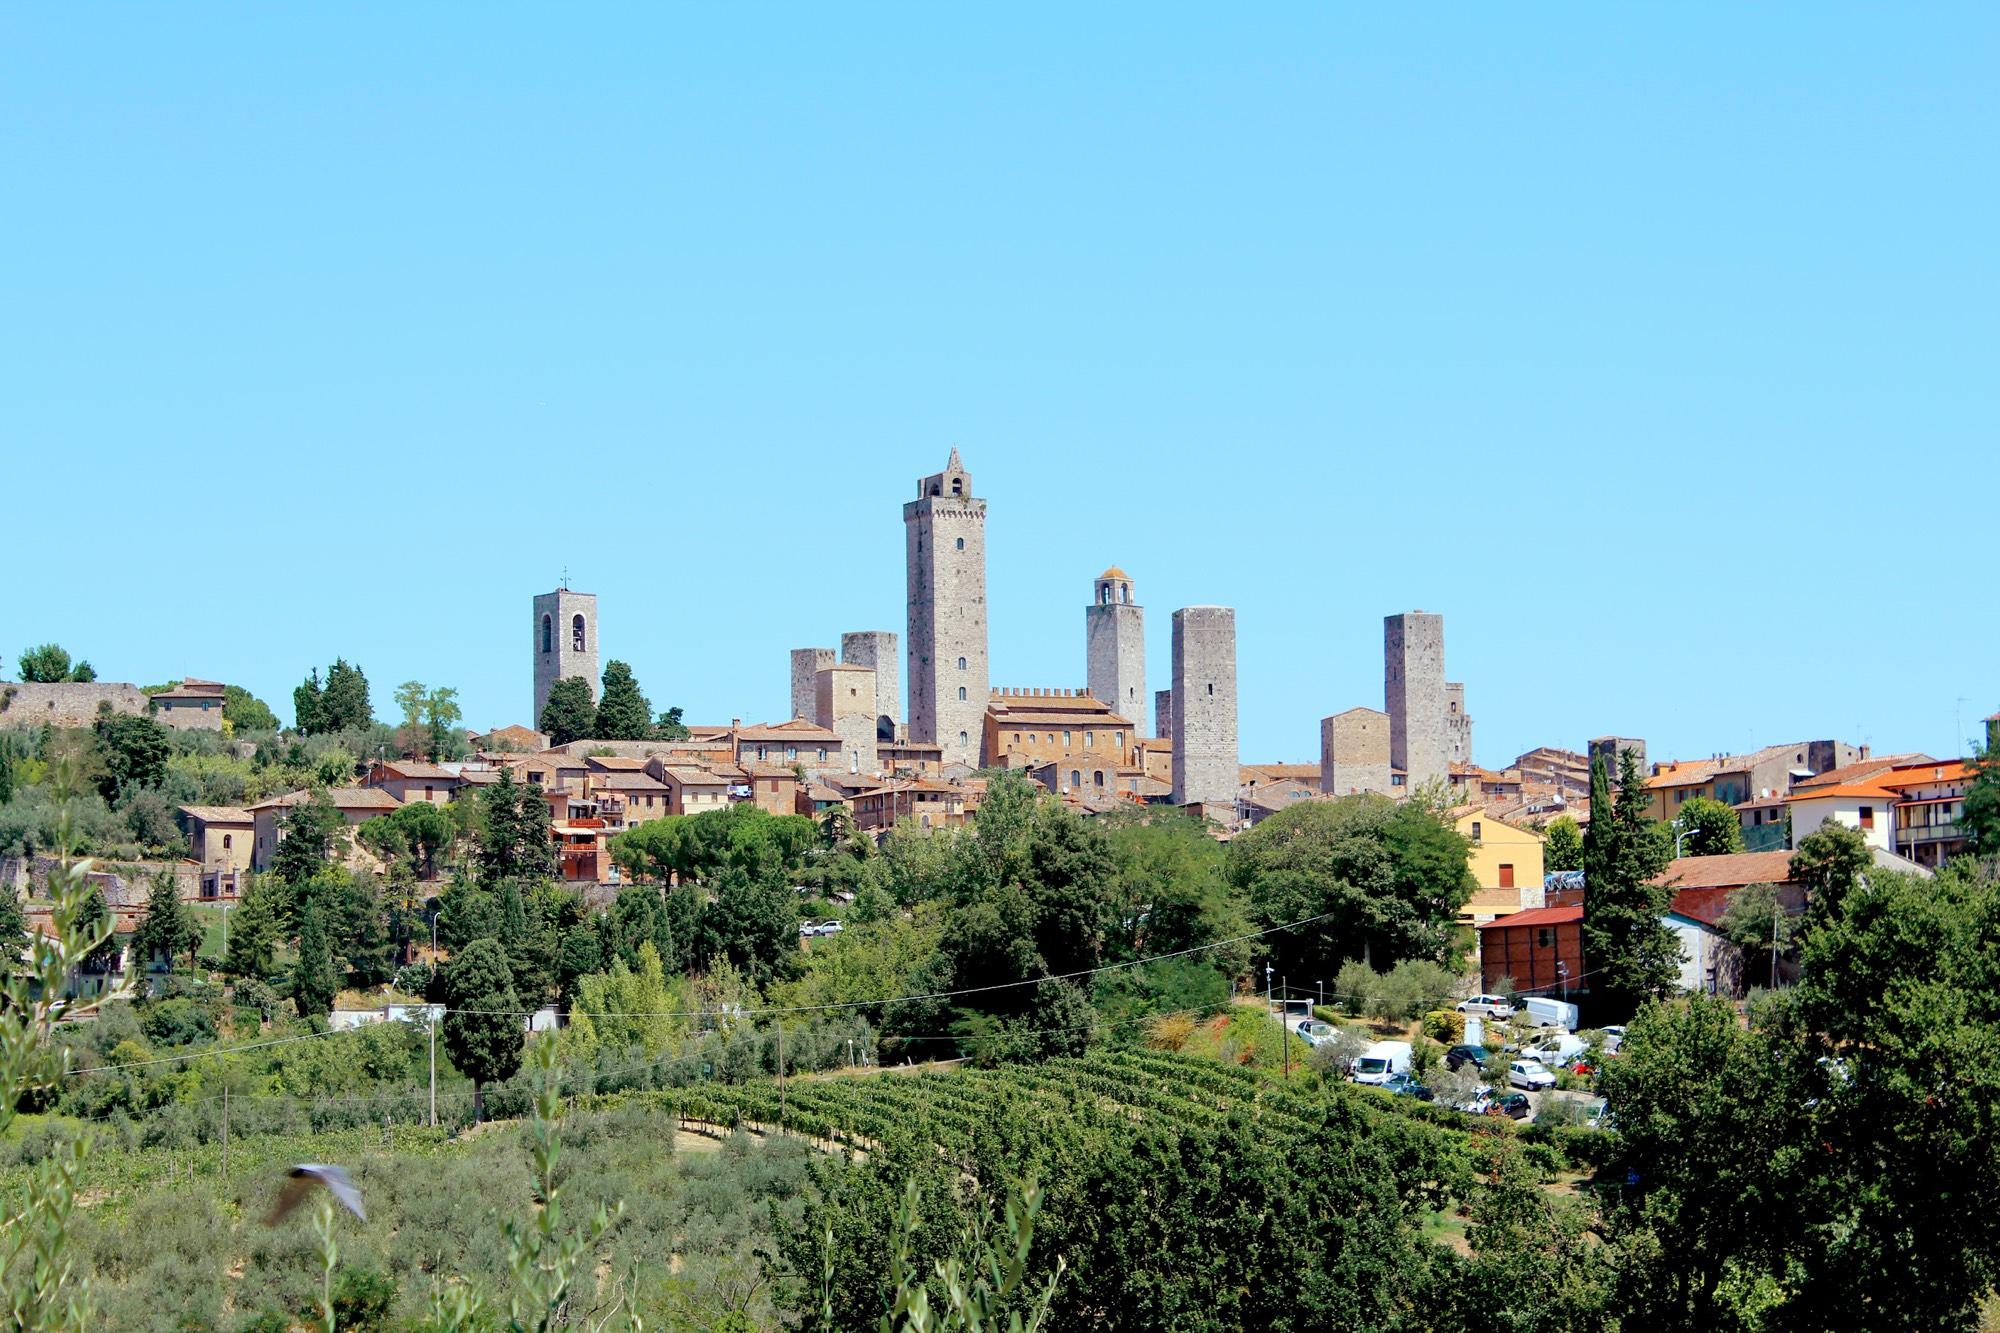 Agriturismo-la-gioconda-Vinci-Firenze-mattia bericchia AlnKHXY9ko0 unsplash